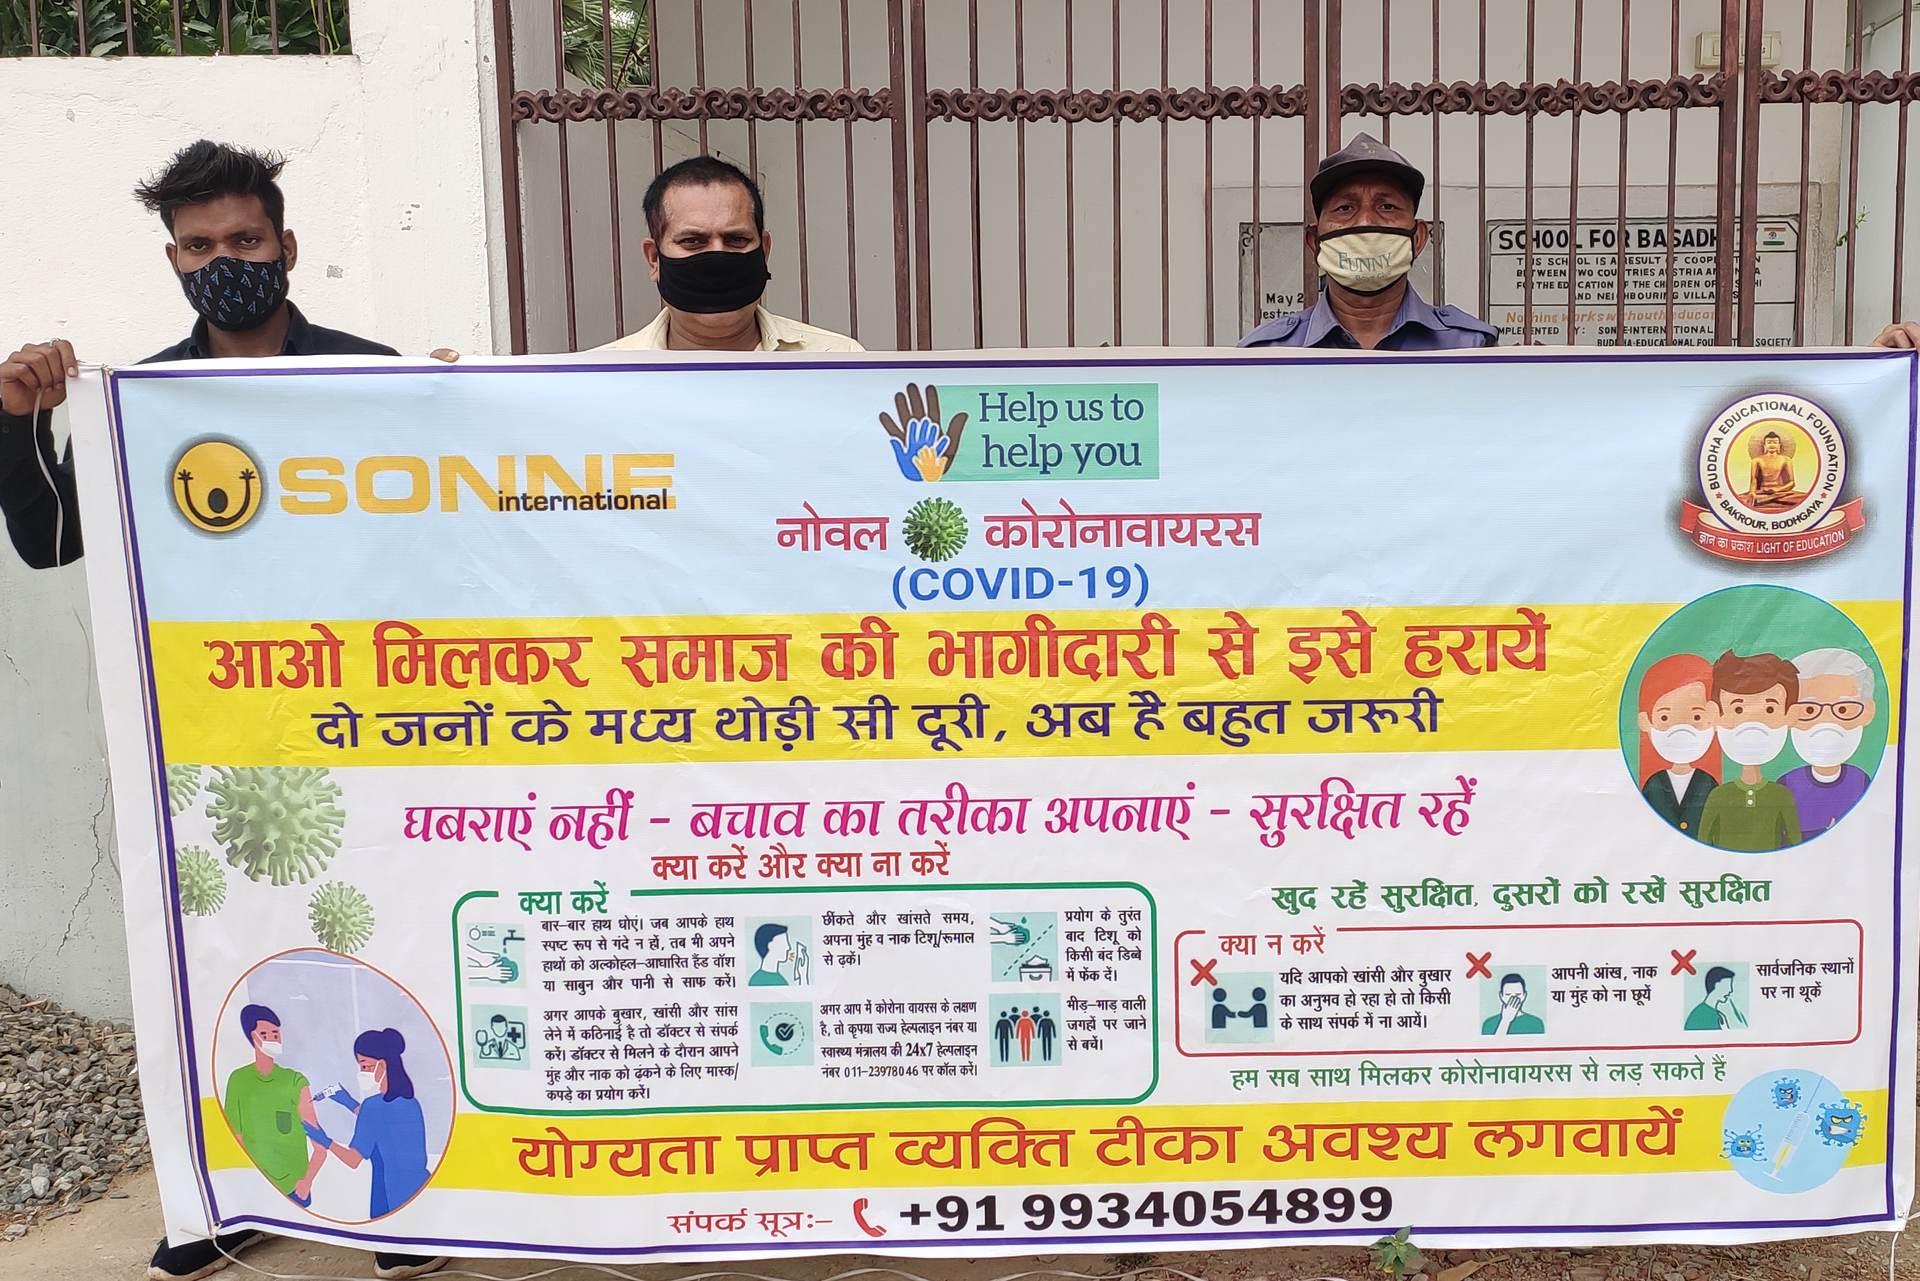 Corona Katastrophe in Indien - SONNE Aufklärungskampagne